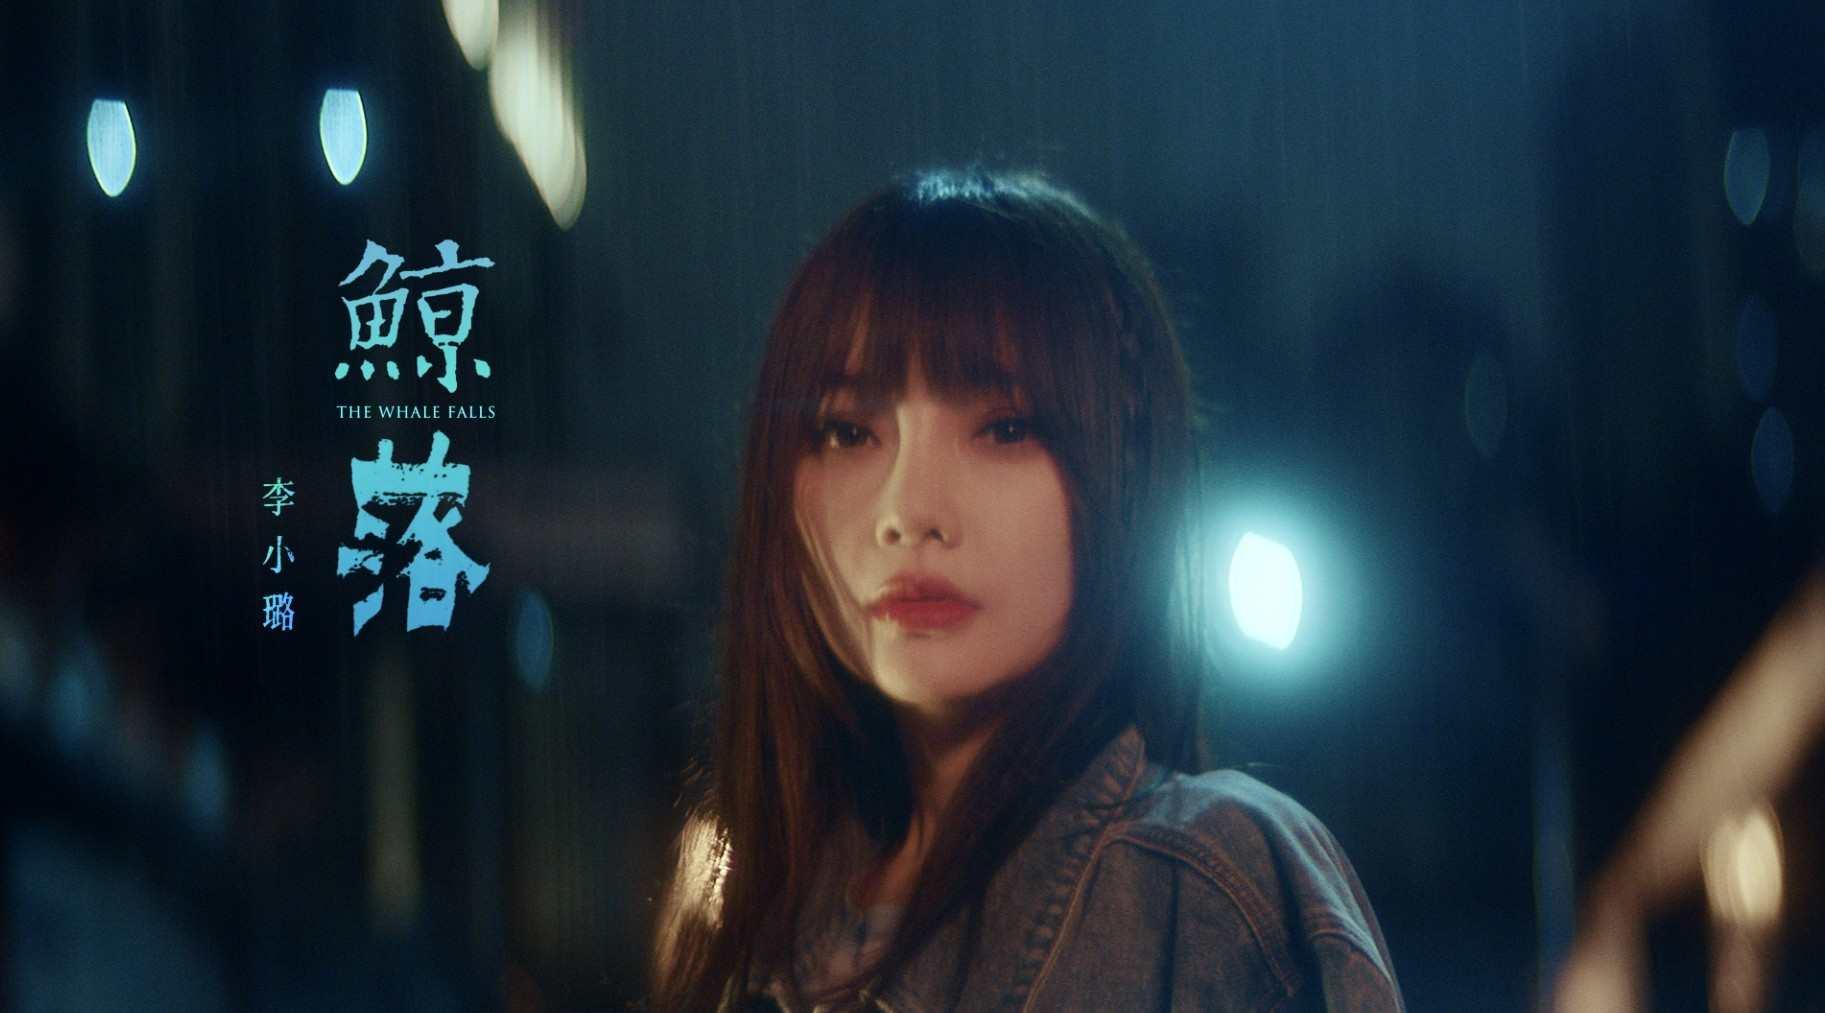 MV丨李小璐《鲸落》水下MV Dir cut